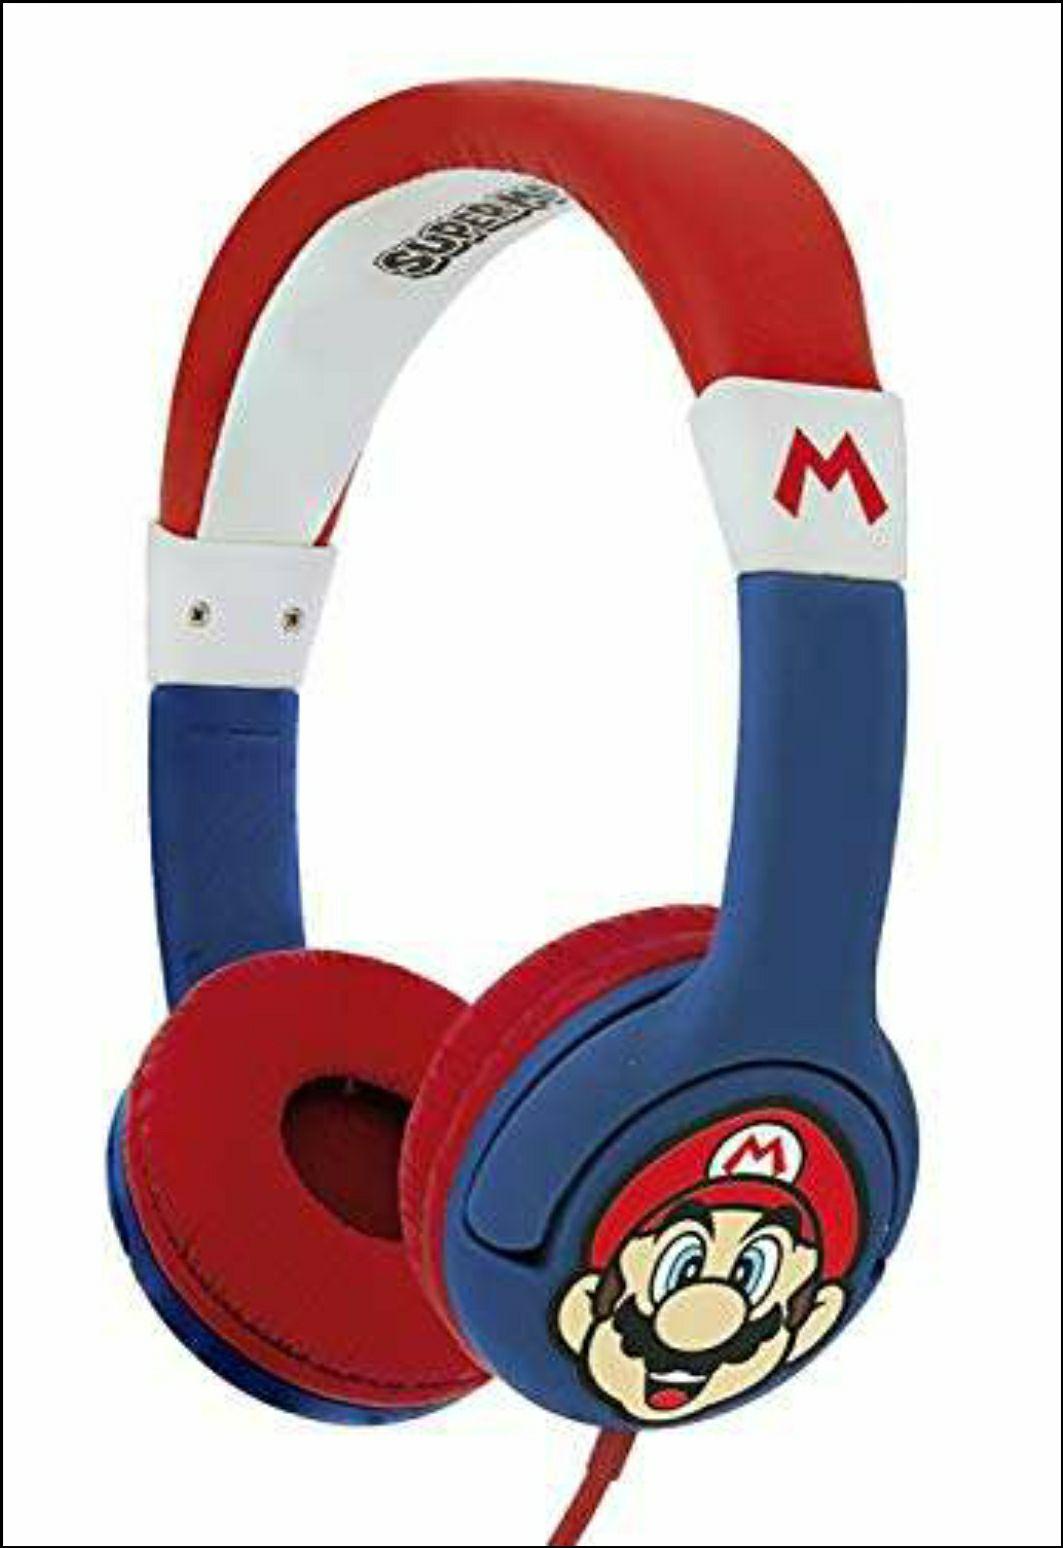 OTL Technologies - Super Mario - Kopfhörer mit Kabel